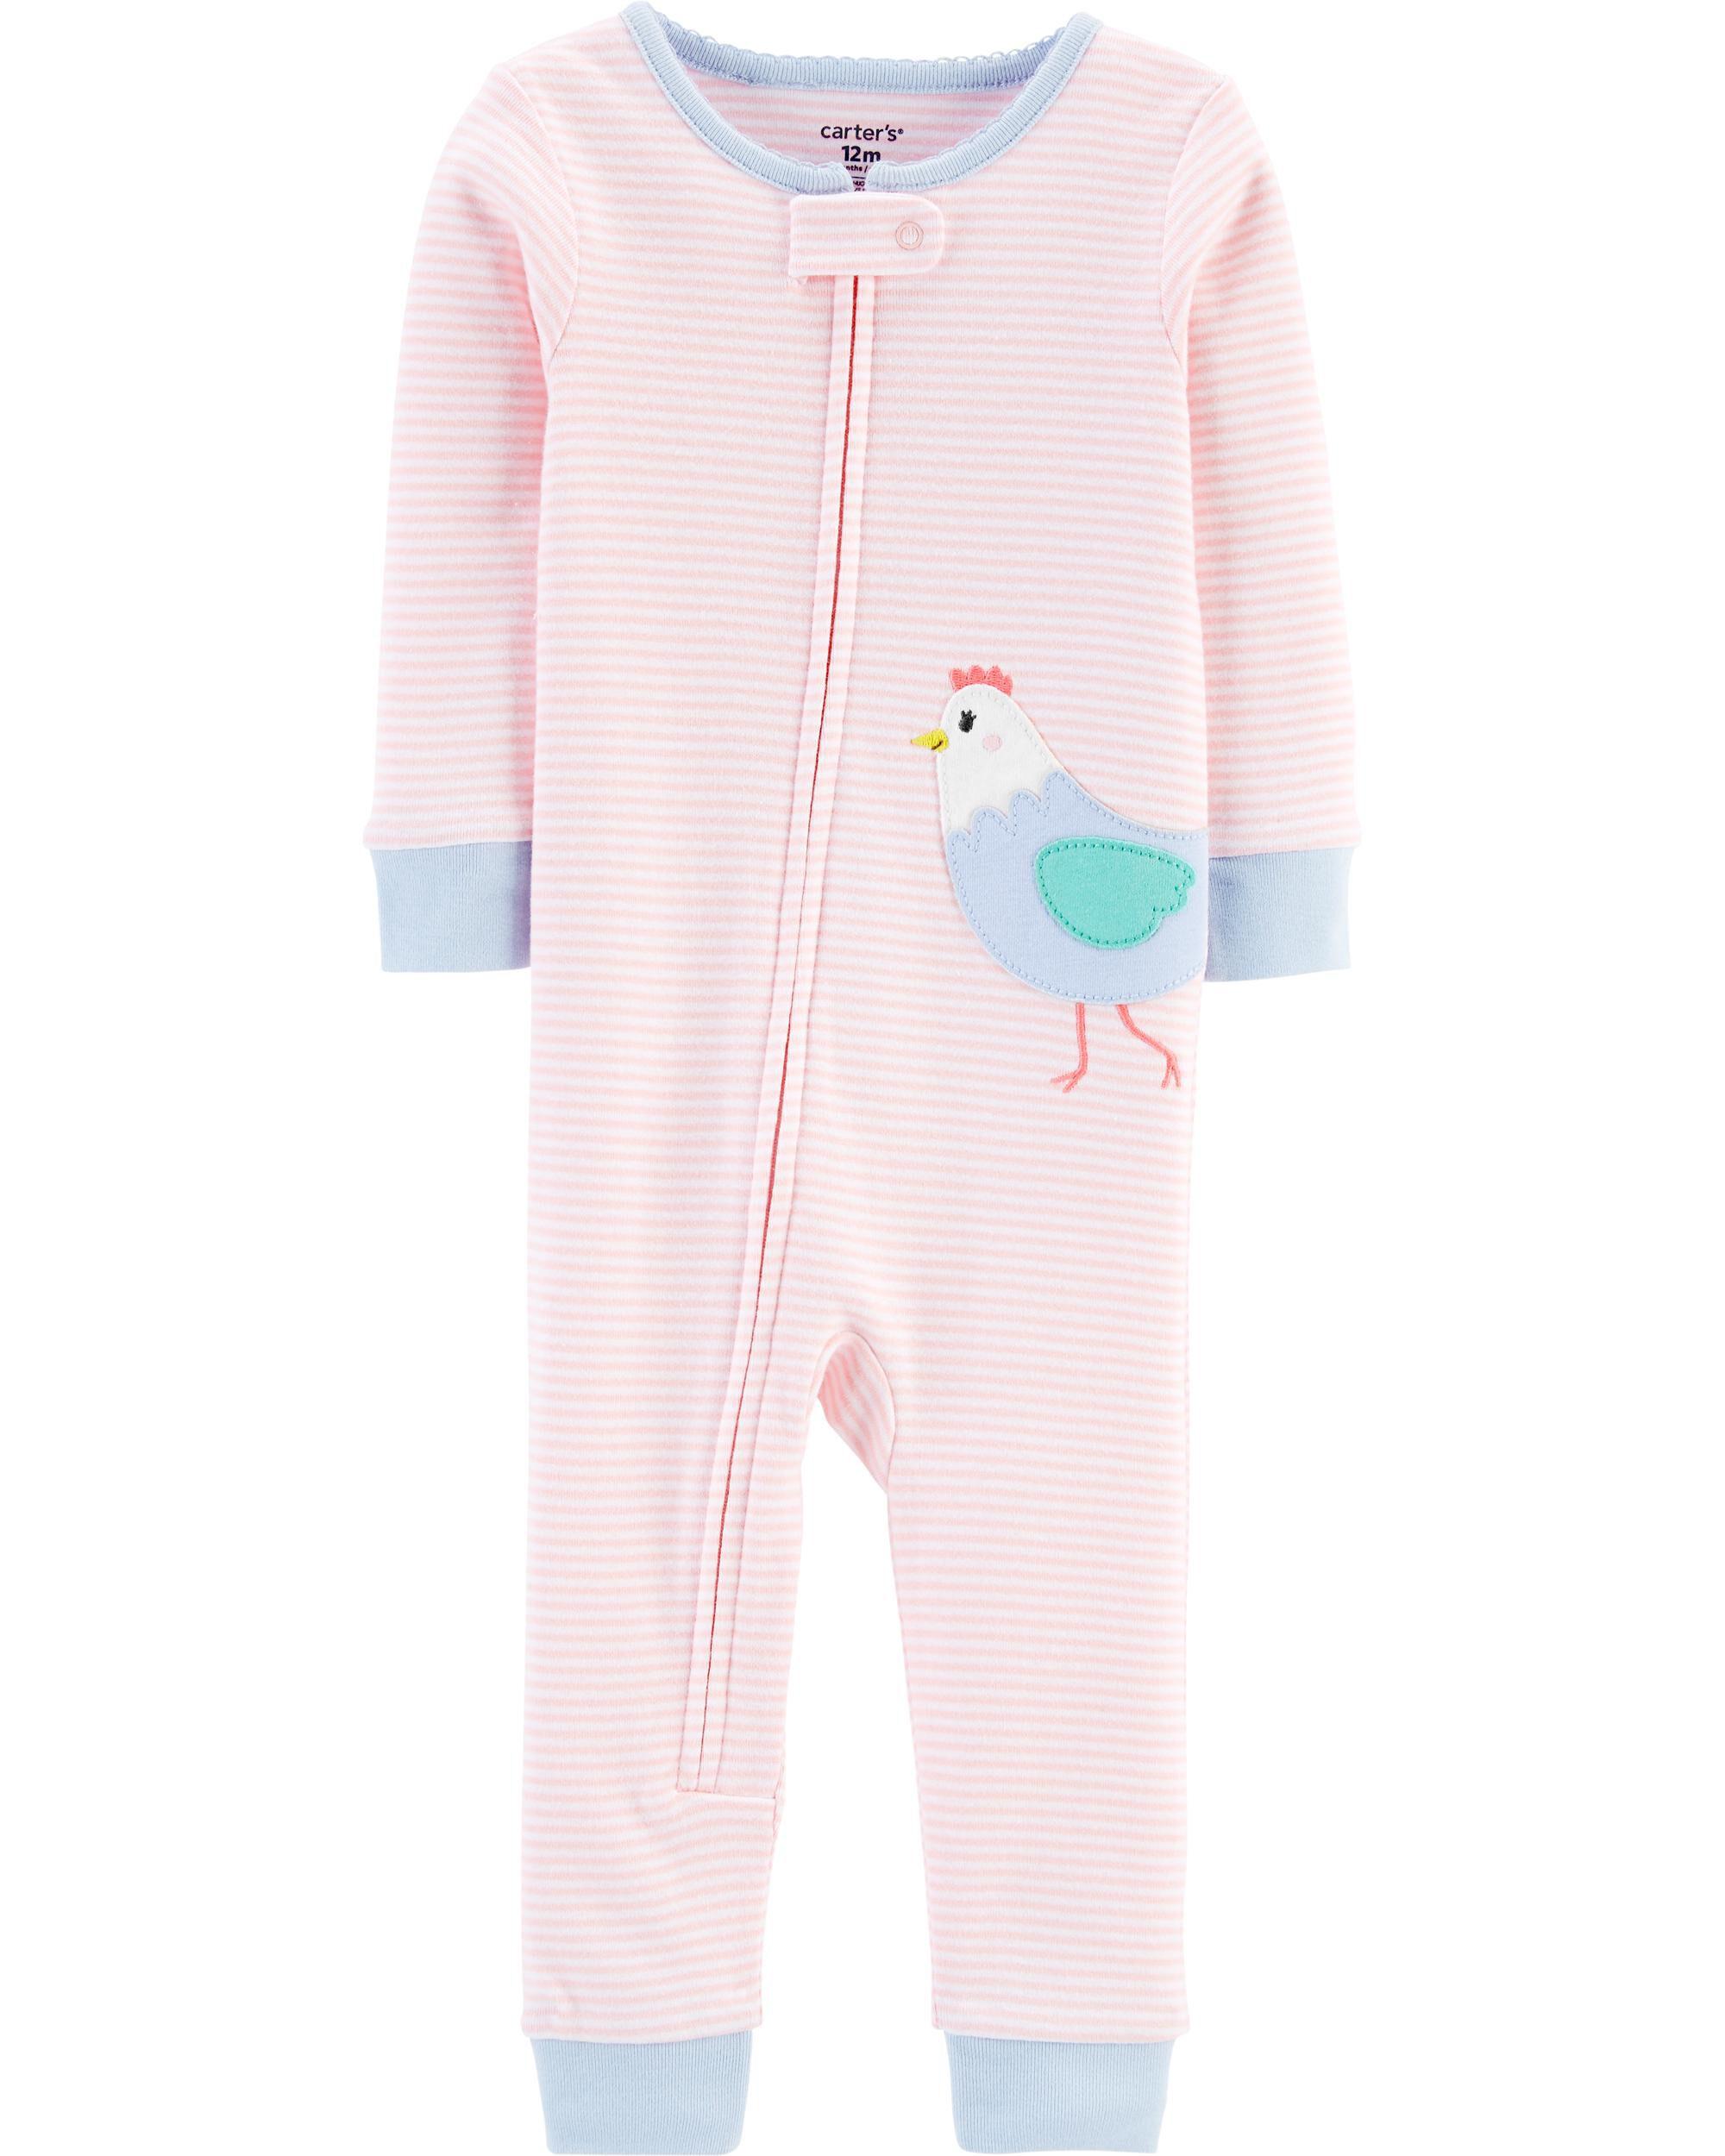 Carters Baby Girls 1-Piece Snug Fit Cotton Footless Pajamas